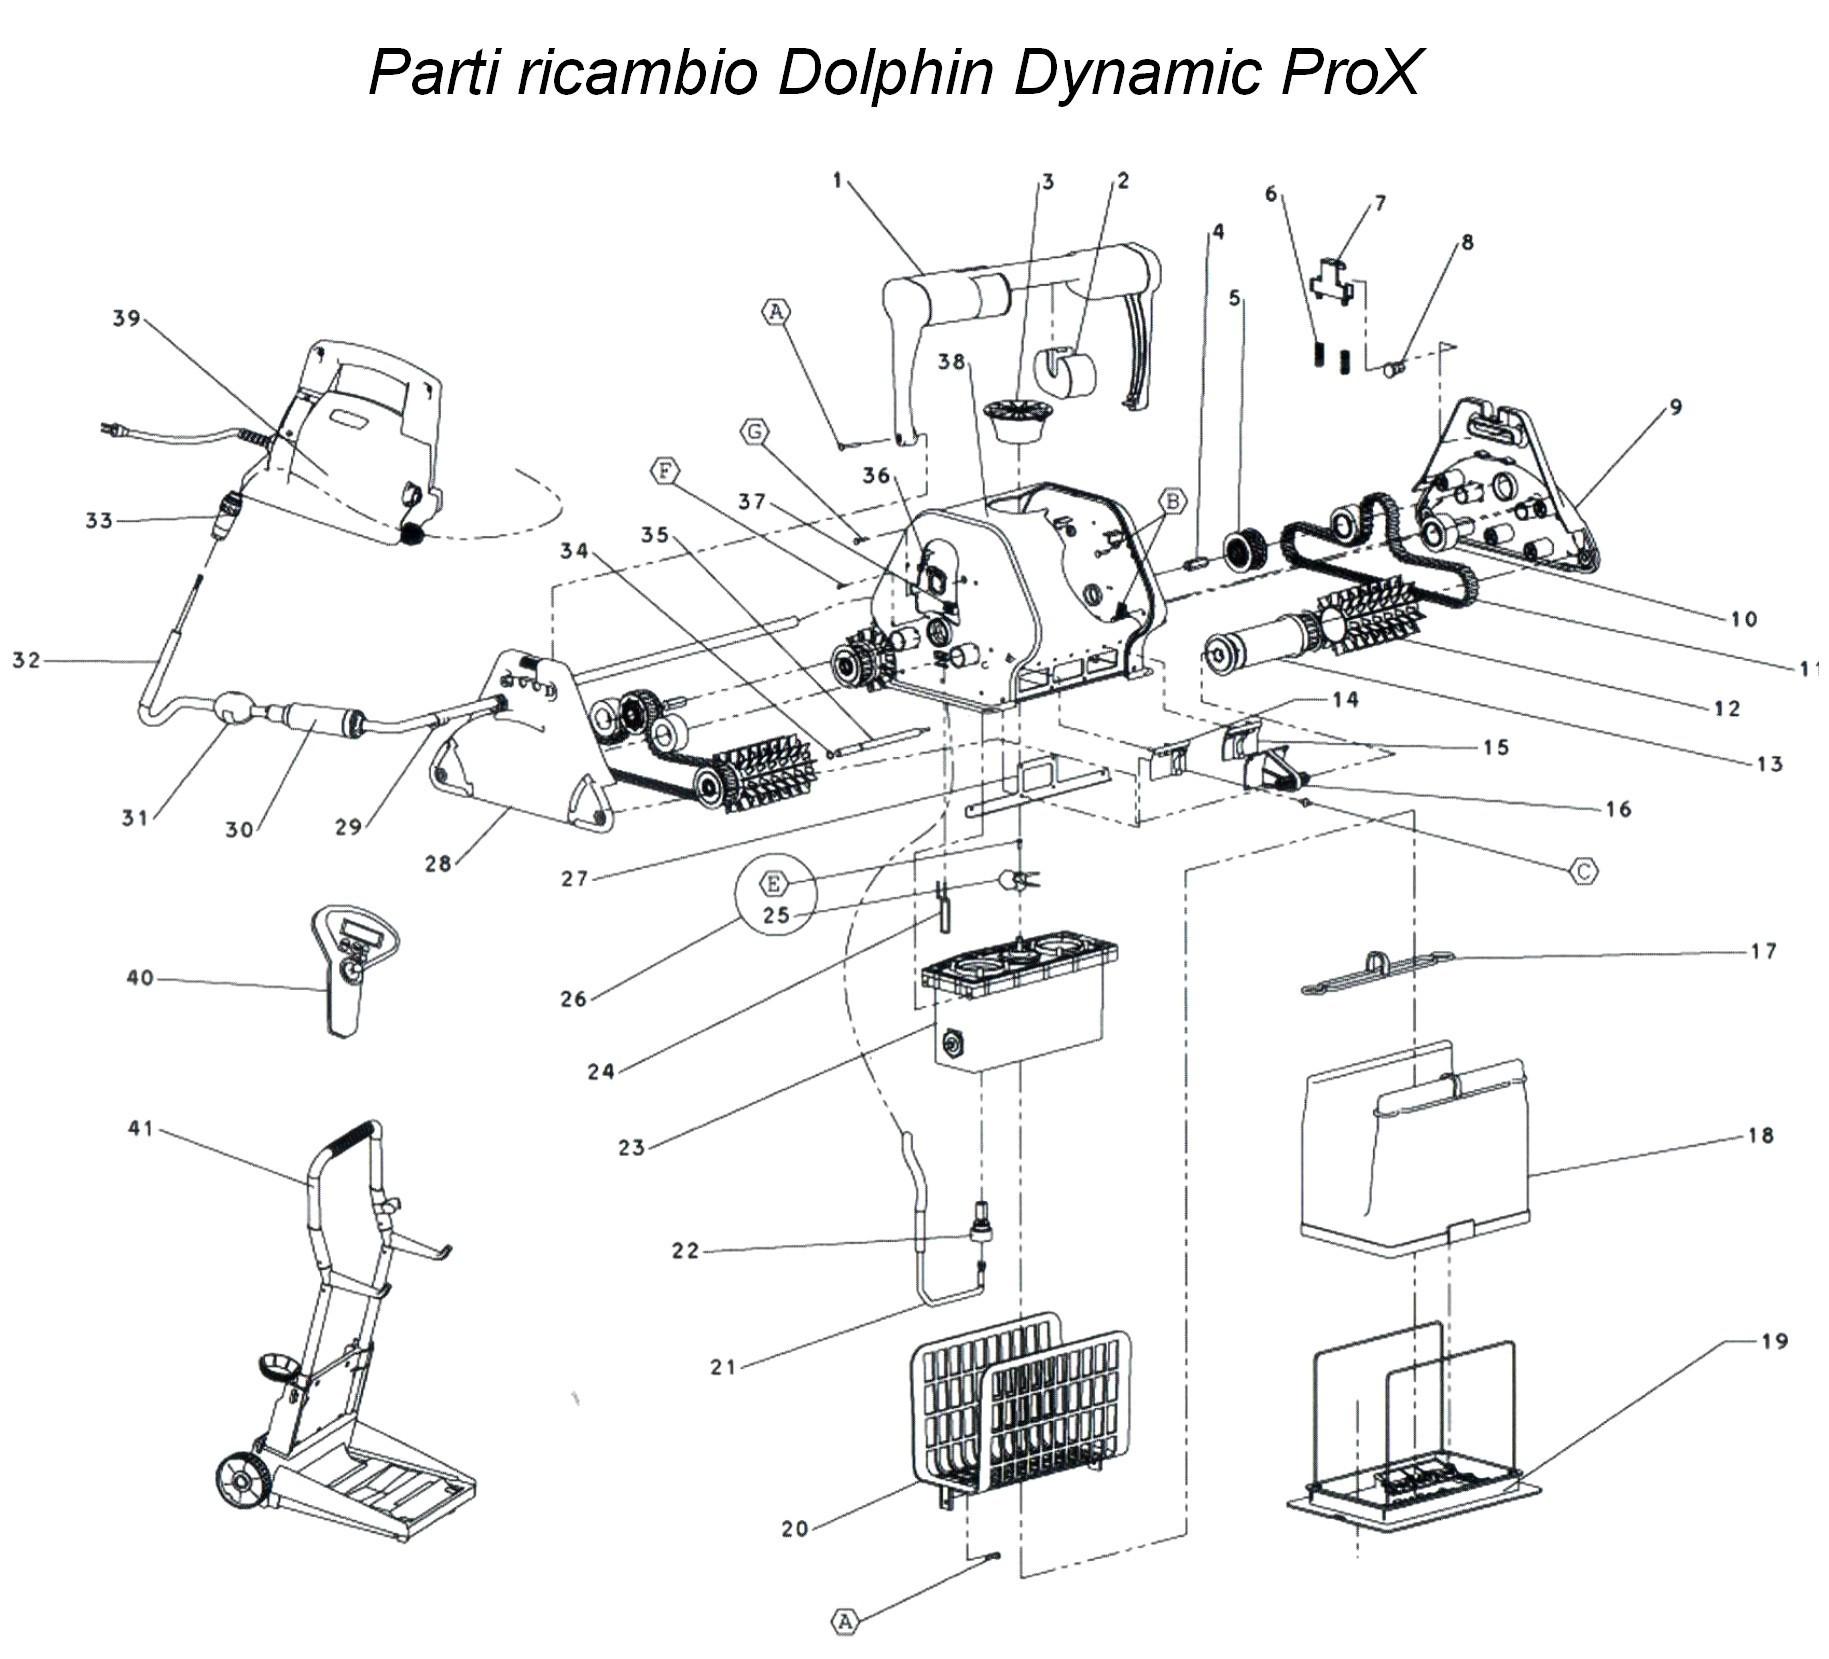 Hydrodynamic 1081 Pool Pump Wiring Diagram - Pin 2000 S10 Wiring Schematic  - hondaa-accordd.furnaces.jeanjaures37.fr   Hydrodynamic 1081 Pool Pump Wiring Diagram      Wiring Diagram Resource